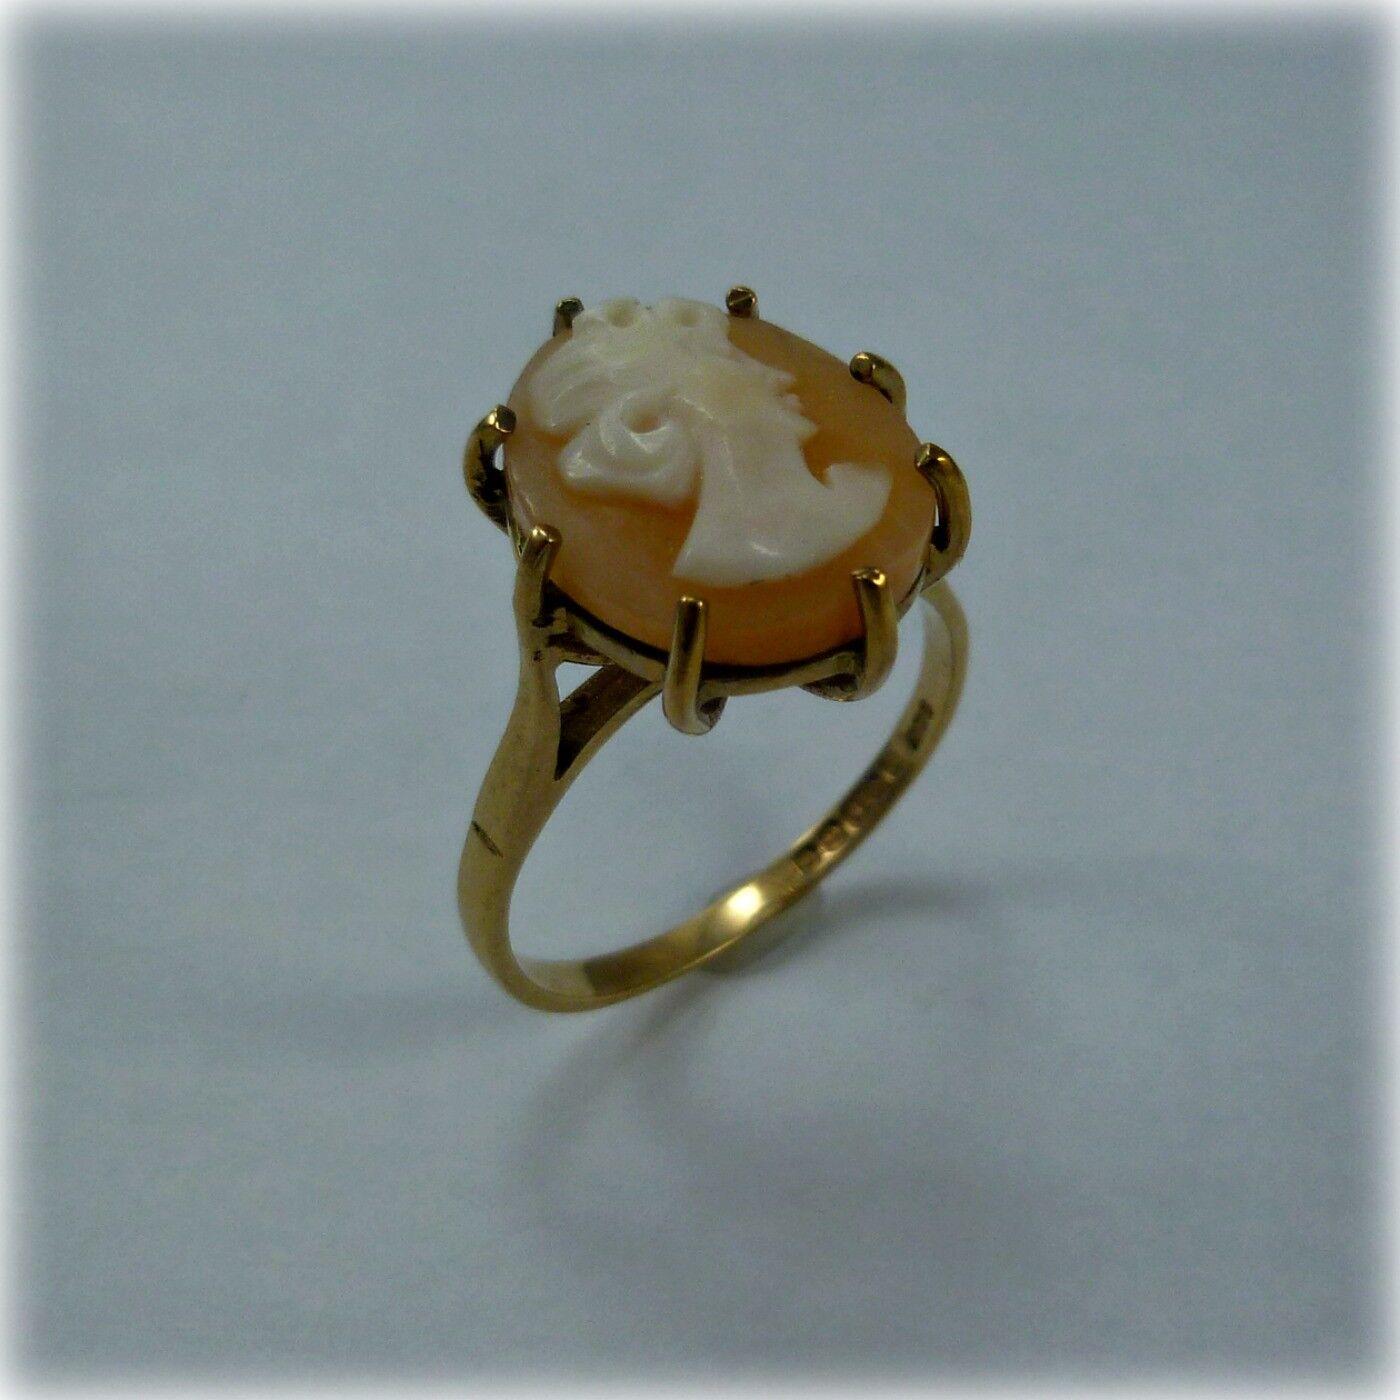 Vintage 9ct gold Cameo Dress Ring, hallmarked 1970